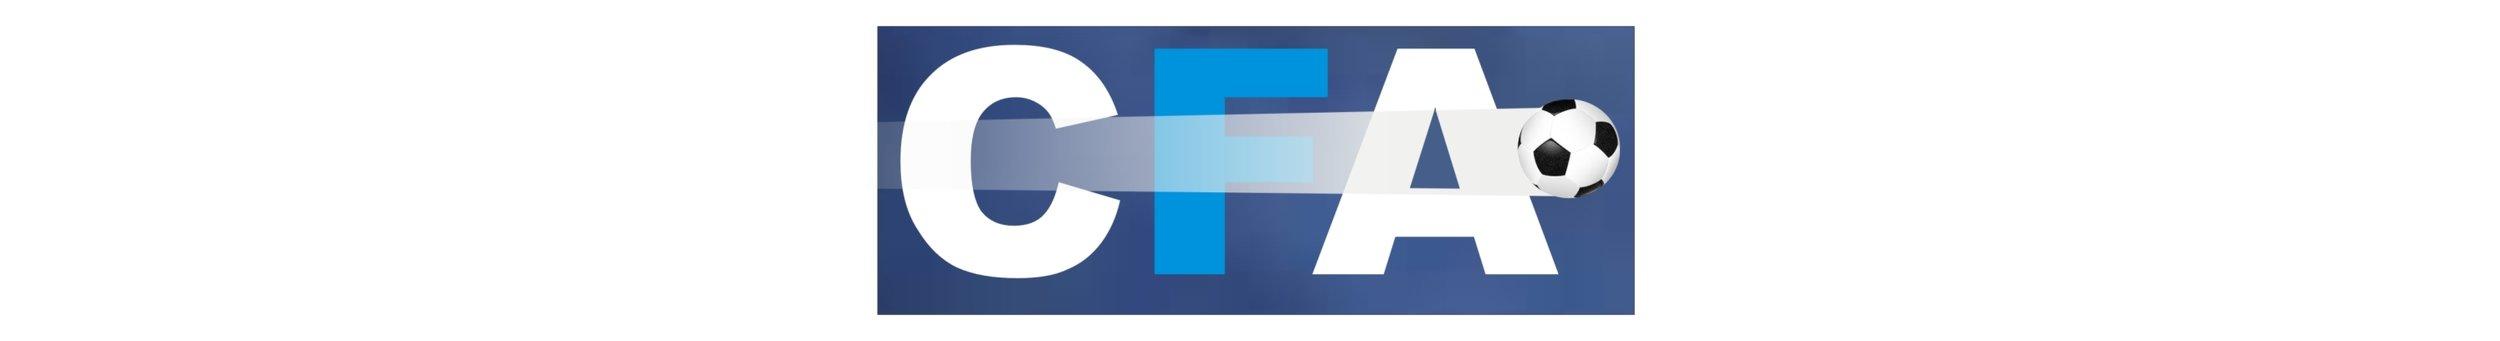 CFA Header.JPG